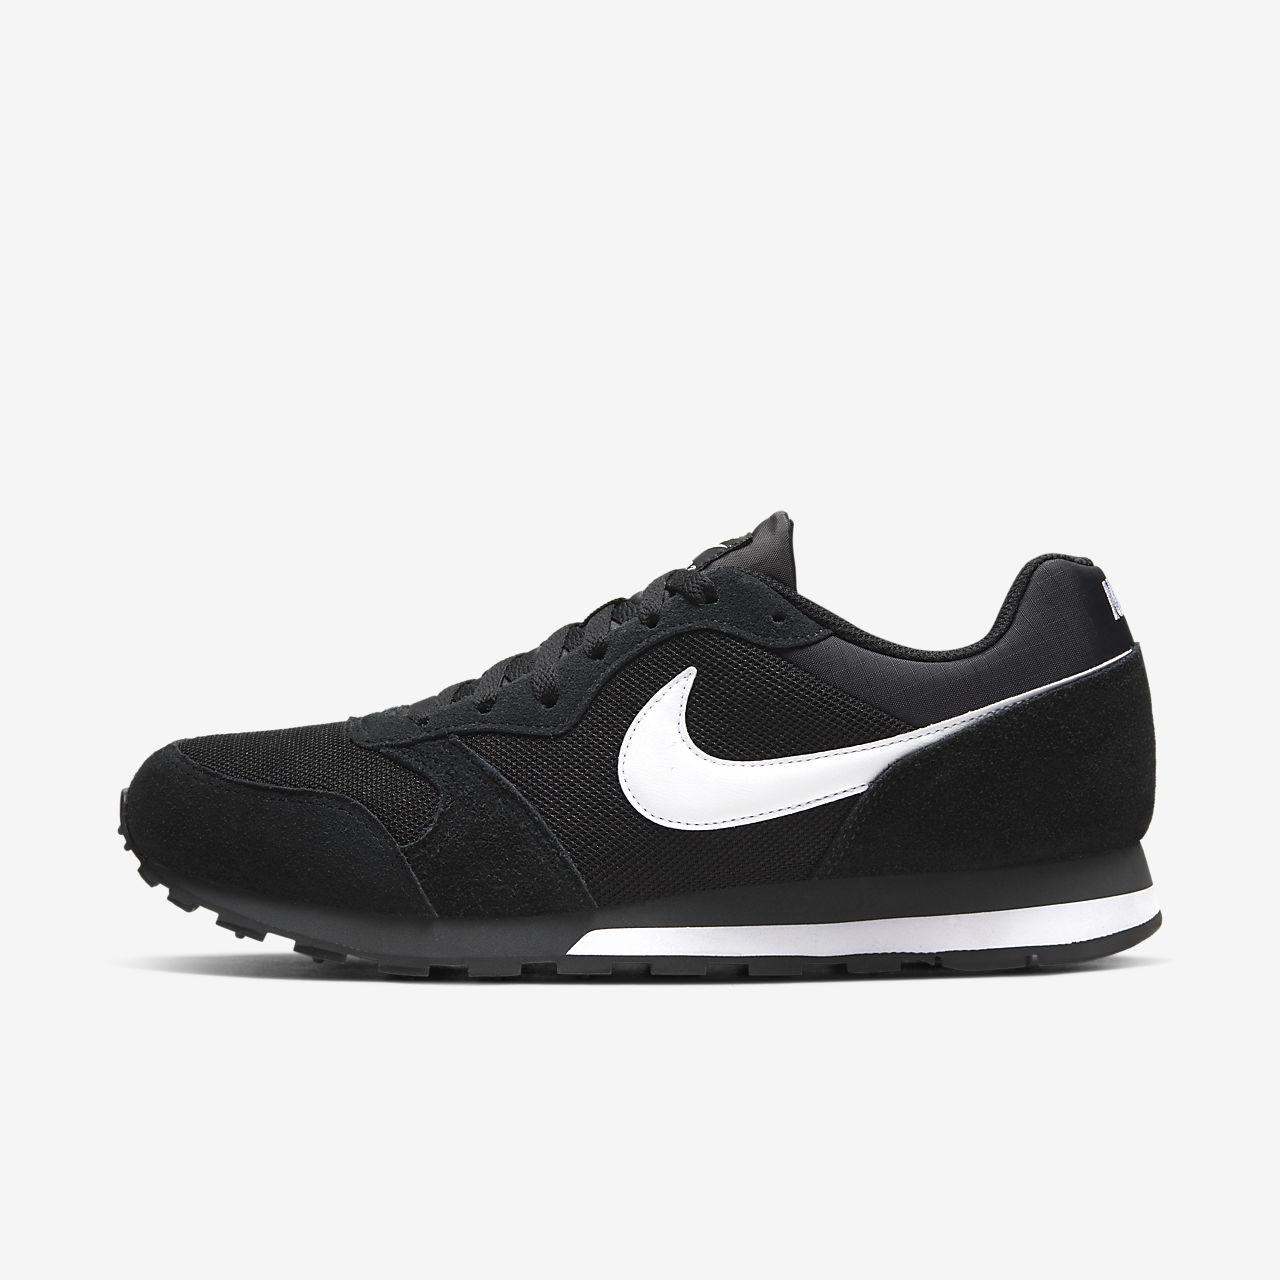 best website b54fb da9a8 Calzado para hombre Nike MD Runner 2